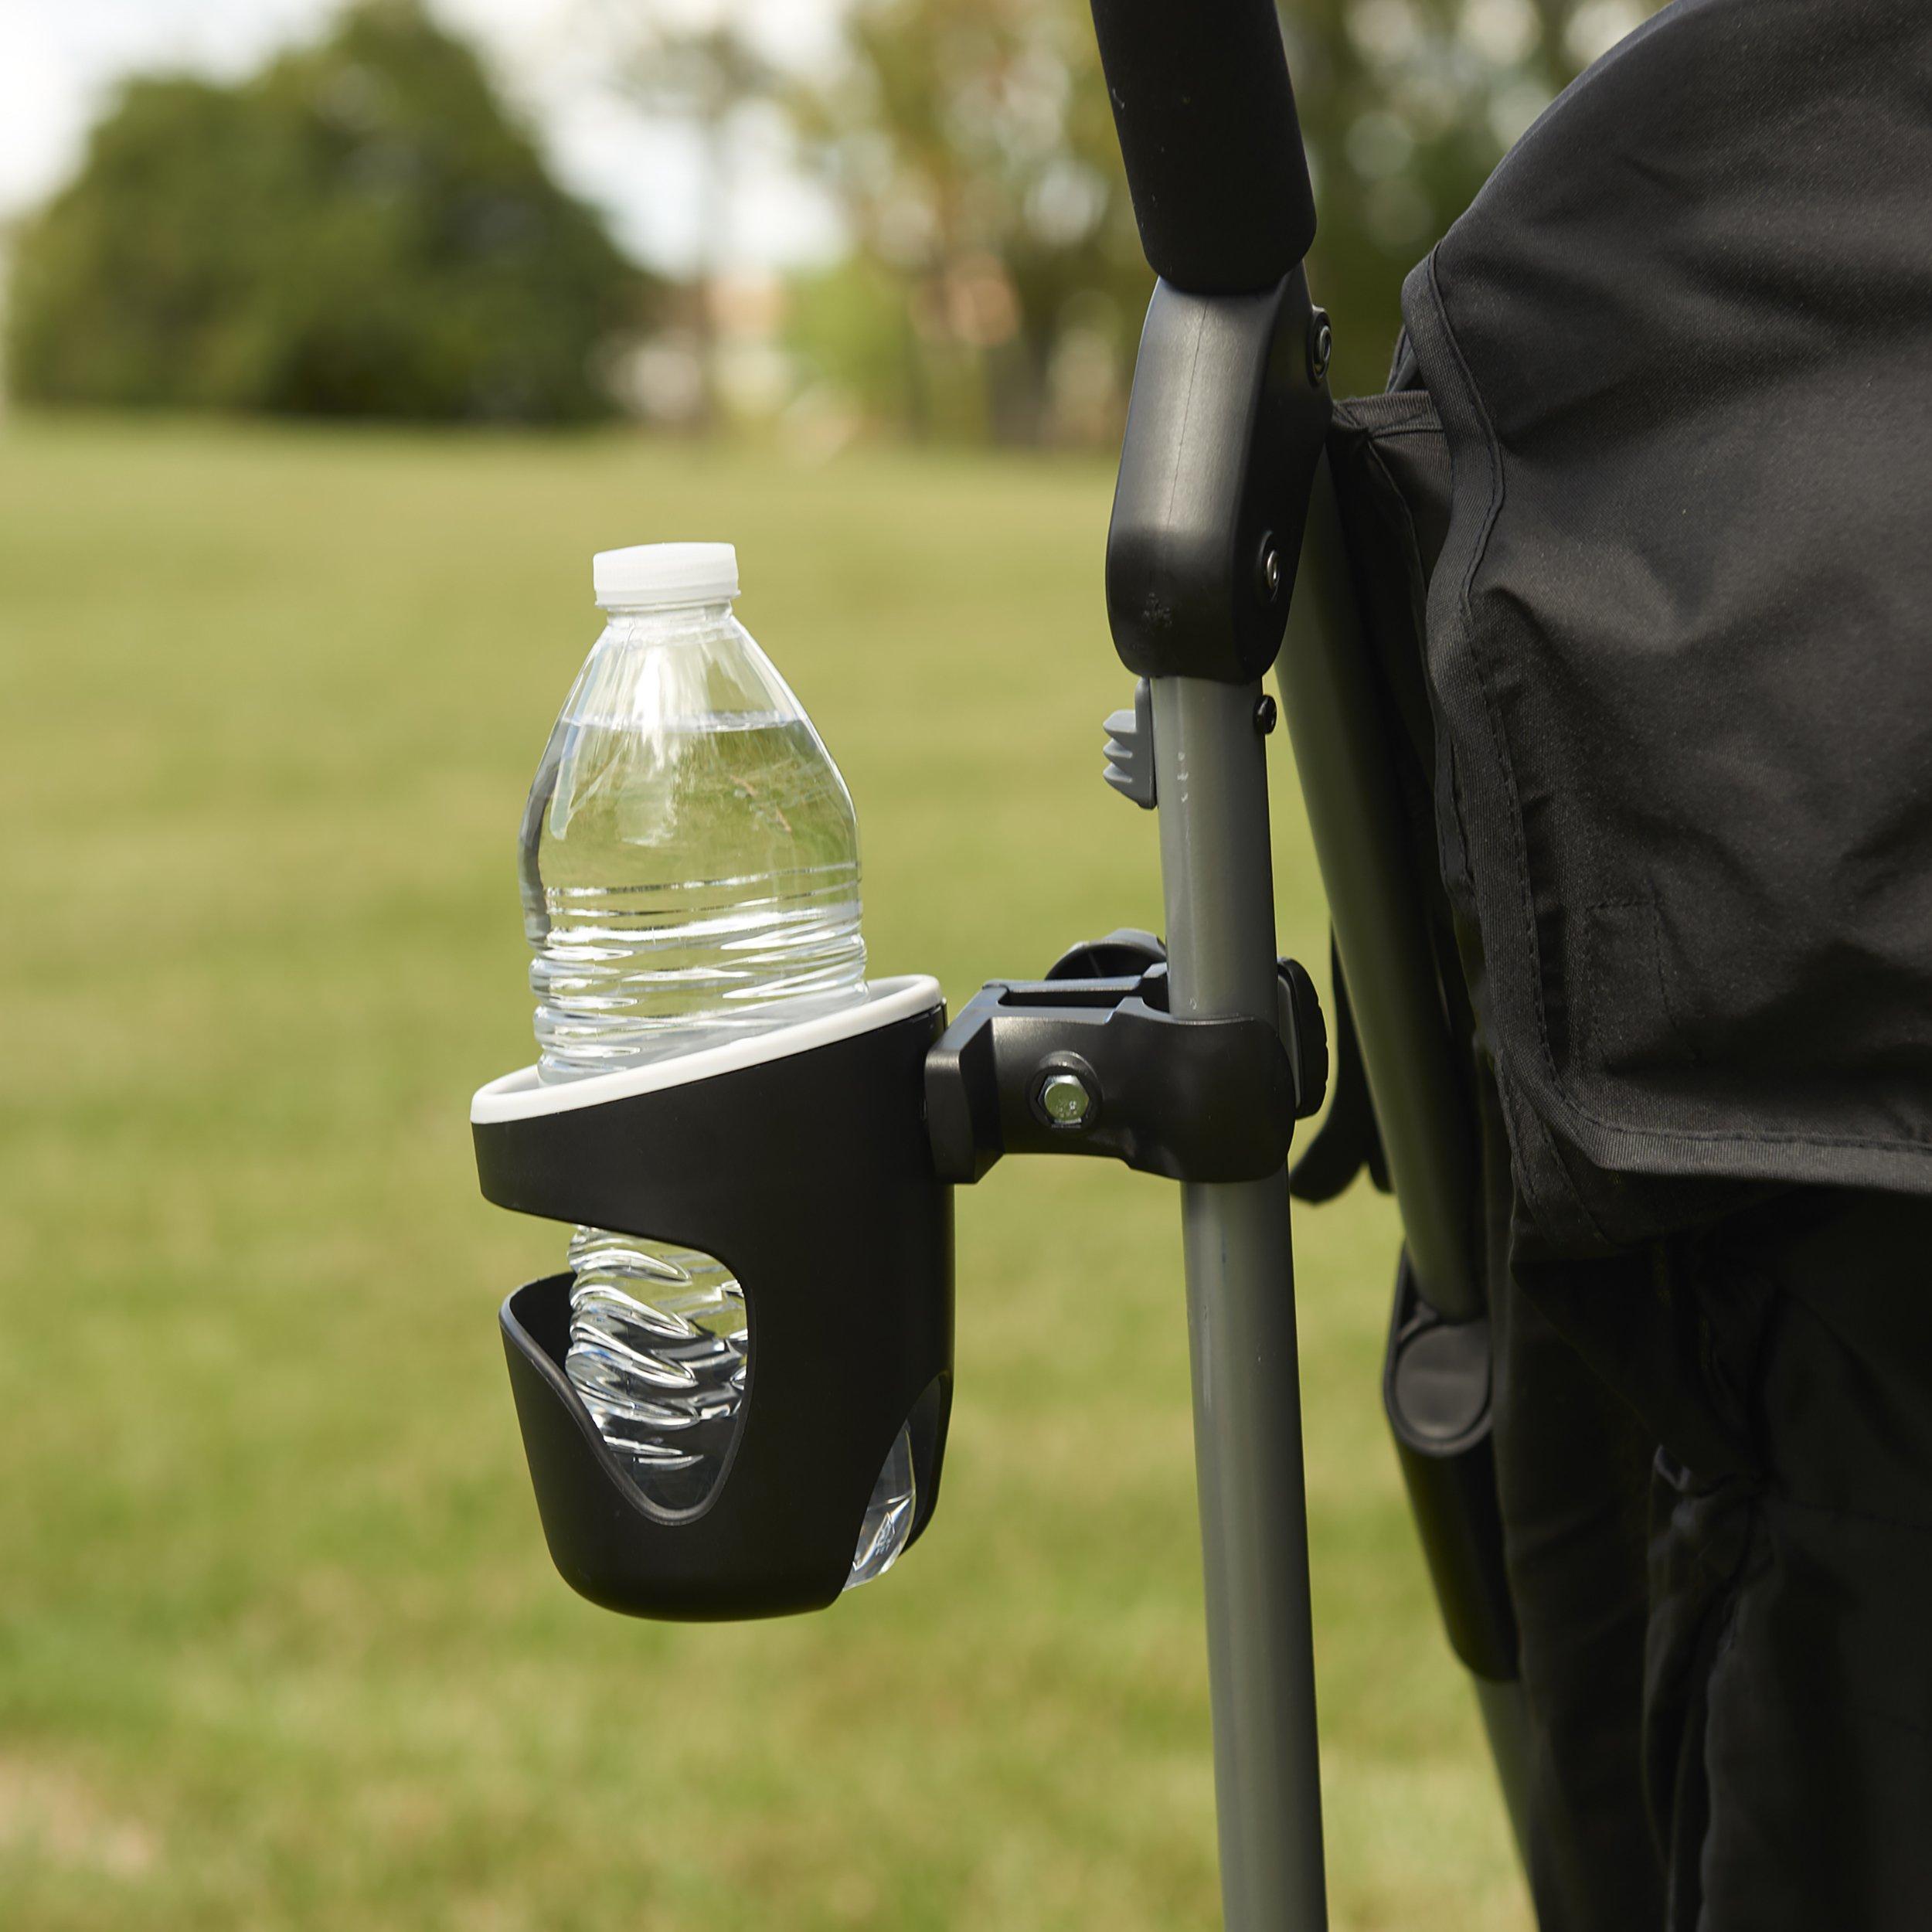 Evenflo Stroller Accessories Starter Kit by Evenflo (Image #11)